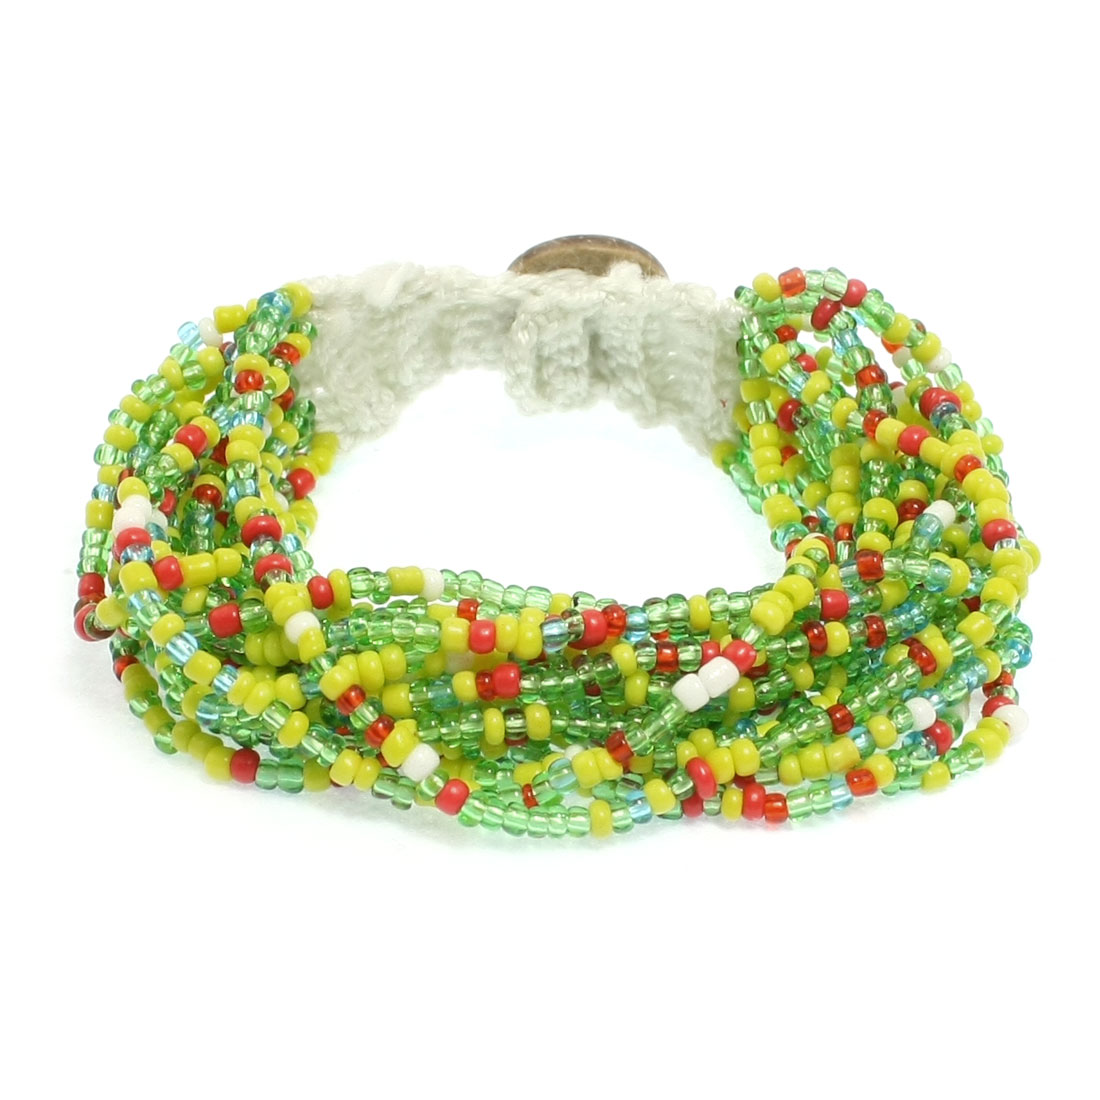 Lady Multicolored Multi String Beaded Handamade Bracelet Wrist Decor